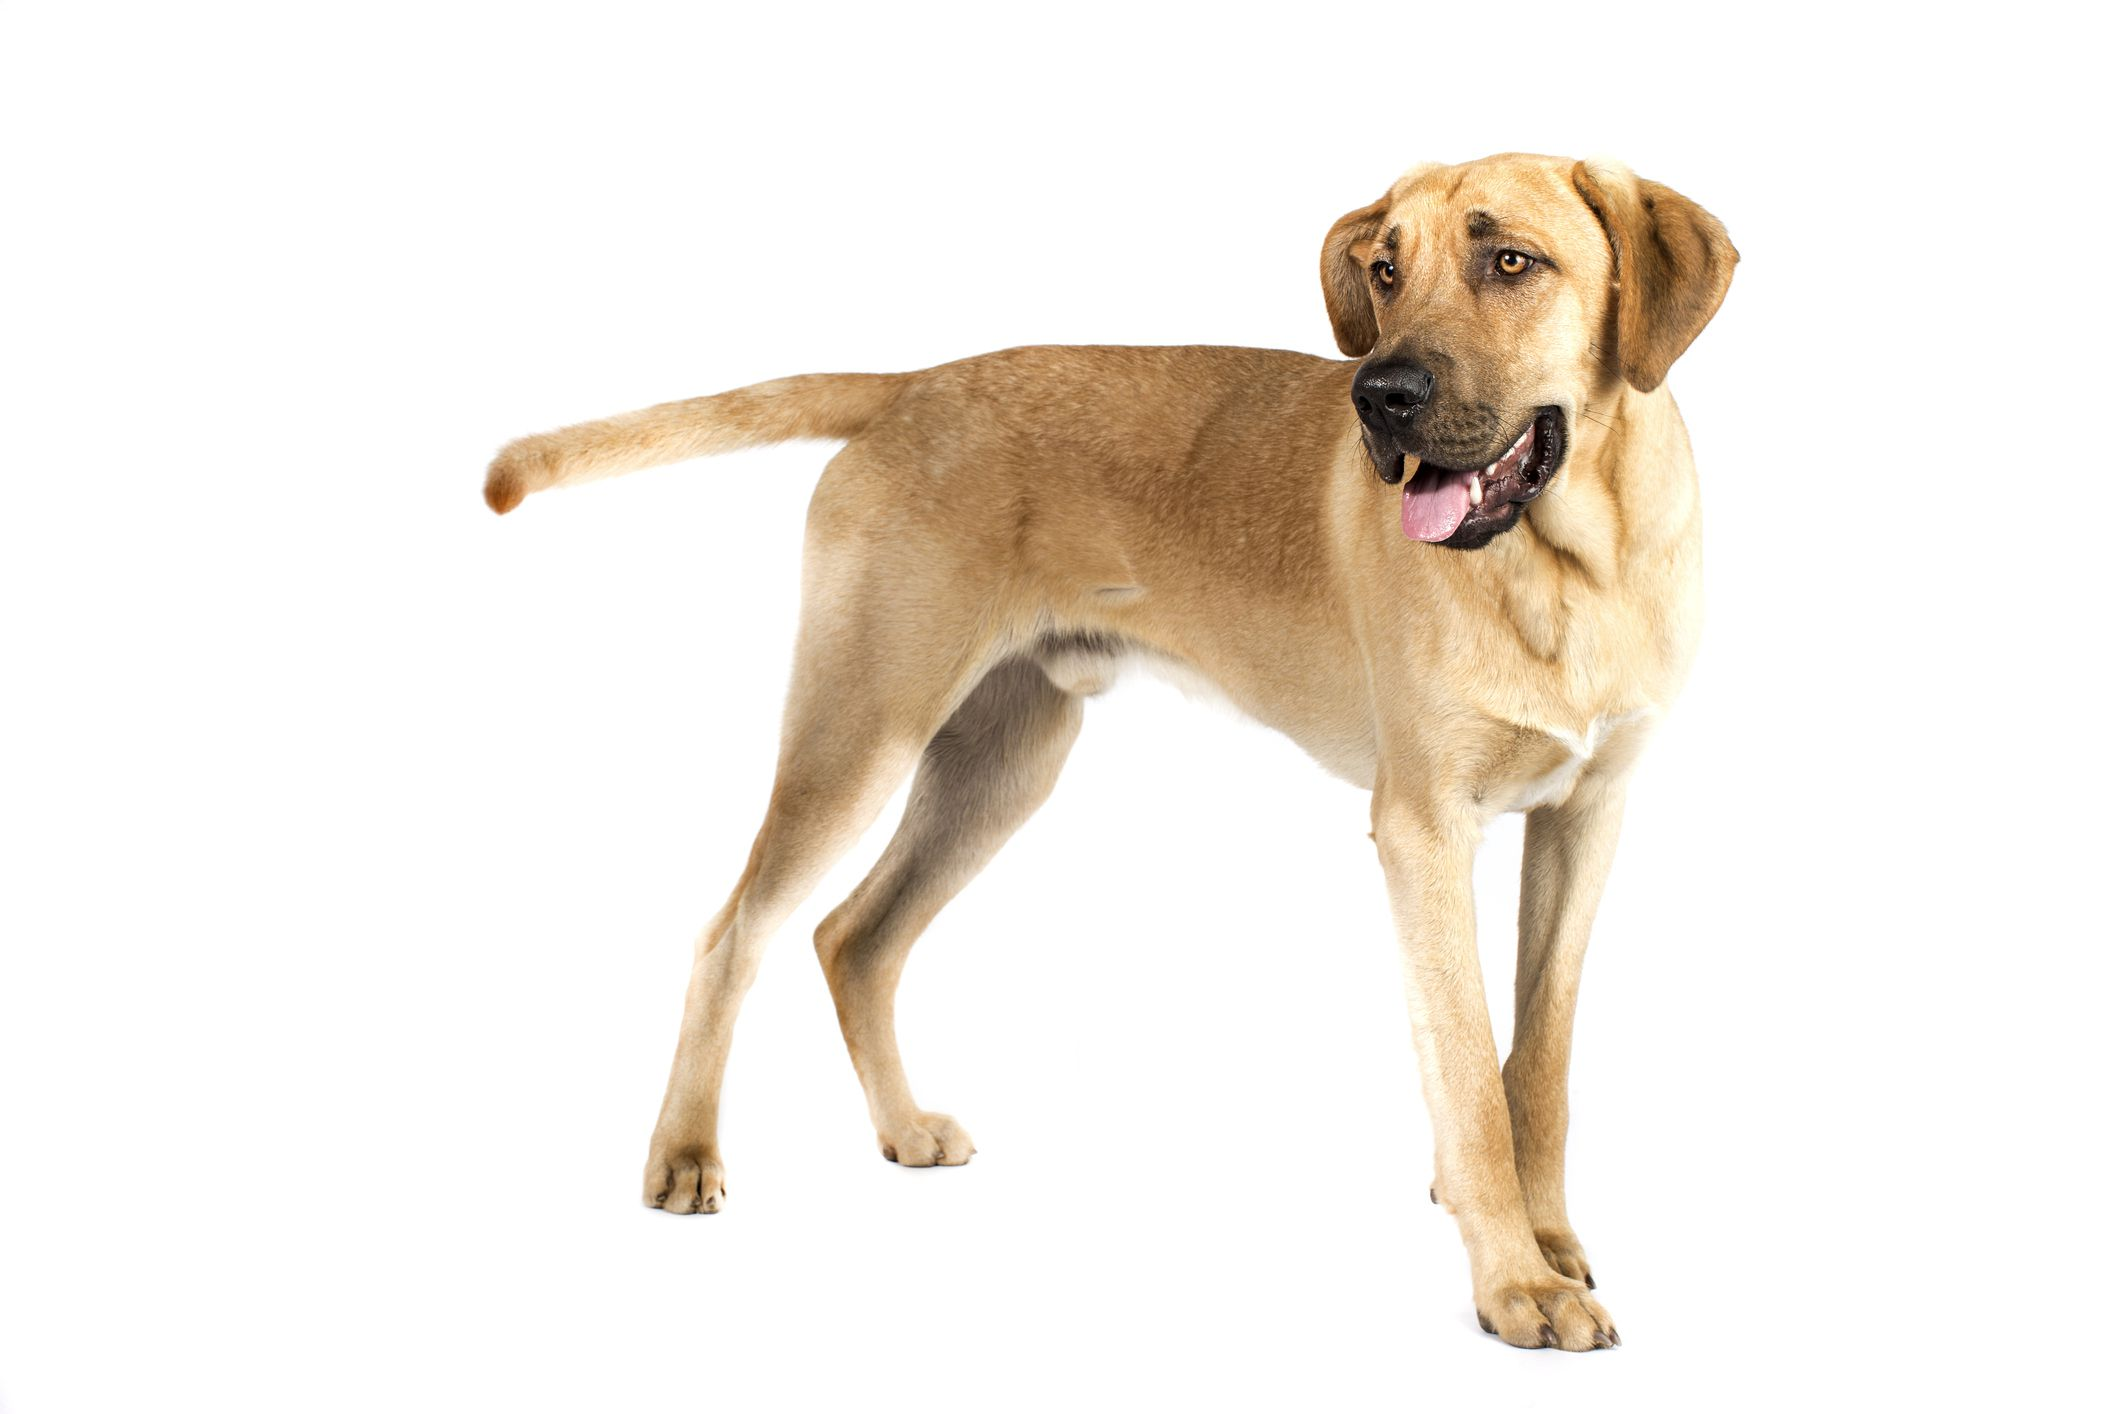 Broholmer dog standing